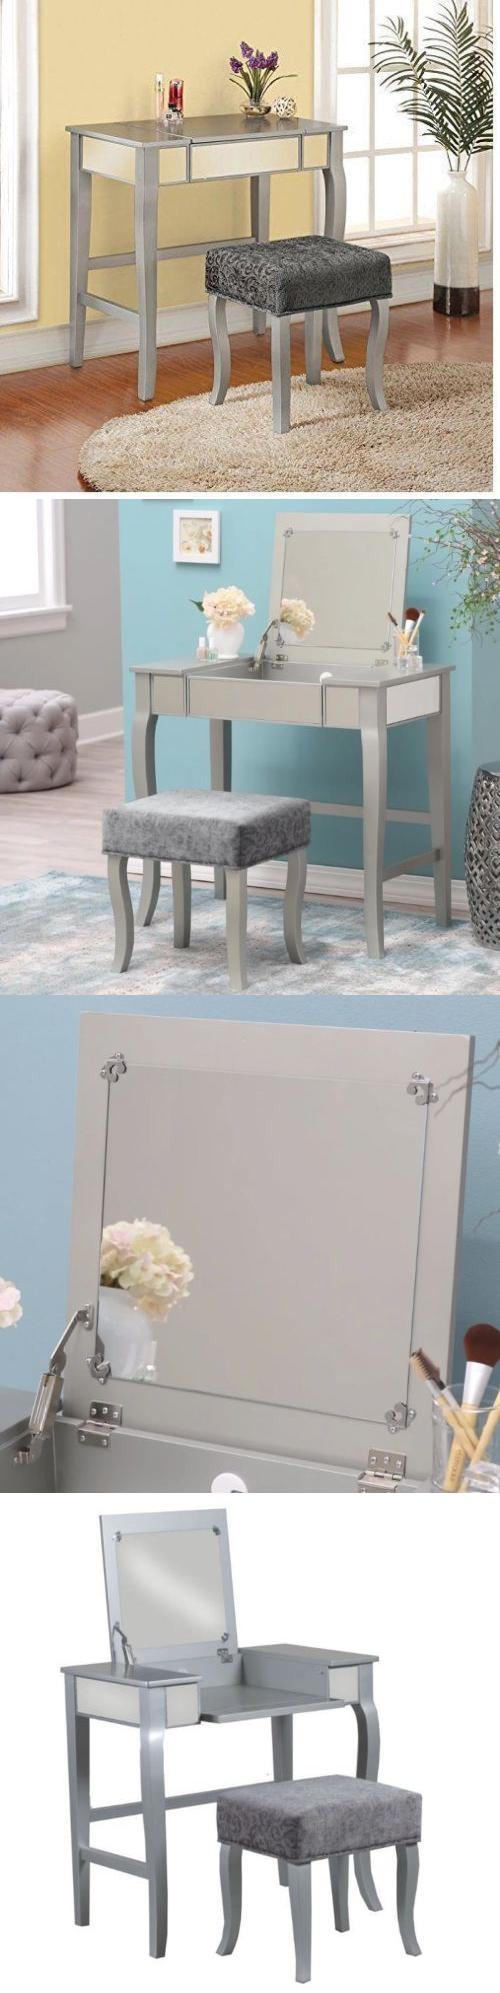 Vanities And Makeup Tables 32878: Vanity Set For Girls And Women Bedroom  Mirror And Bench